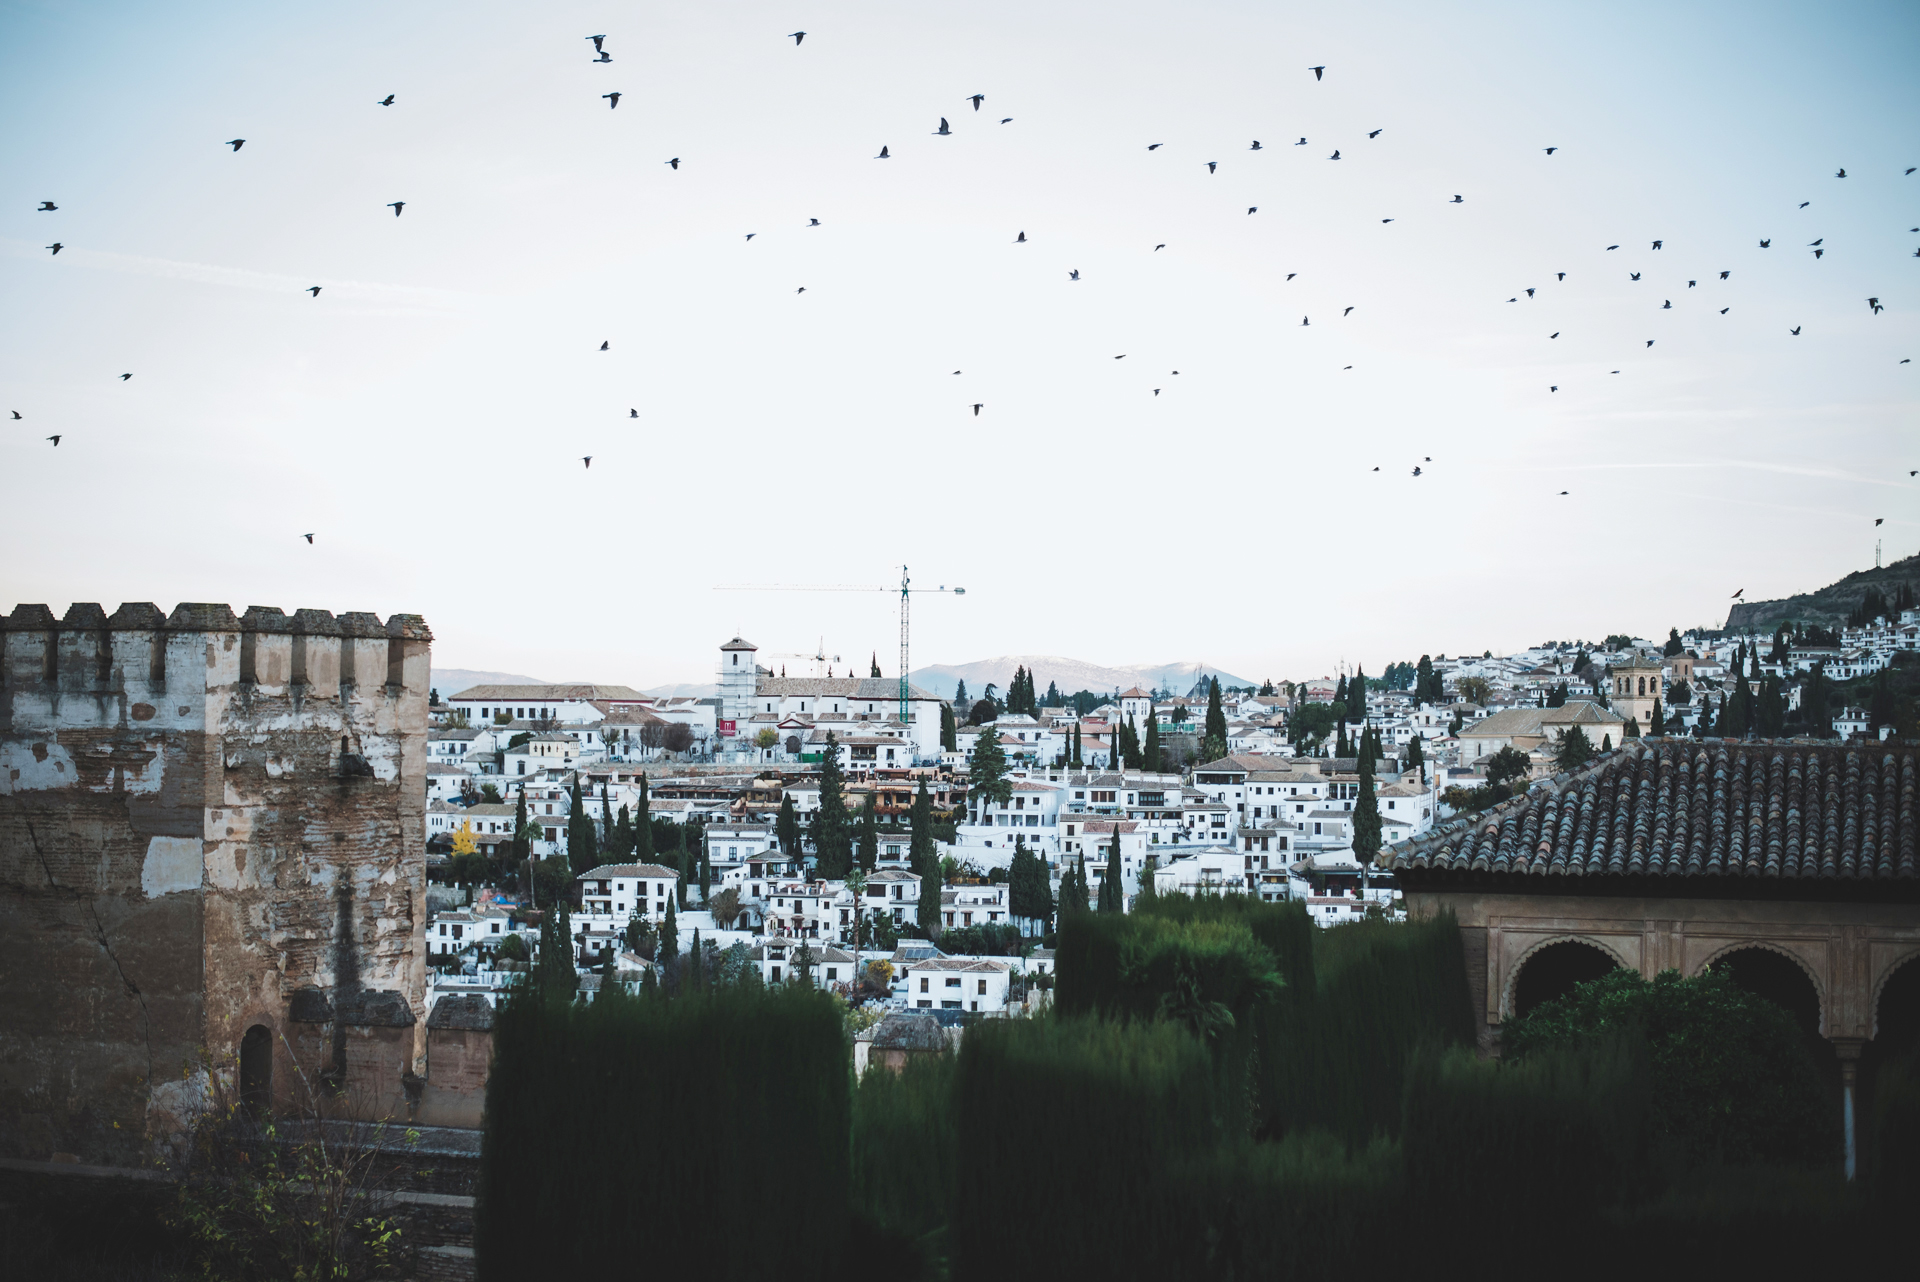 granada alhambra wstęp